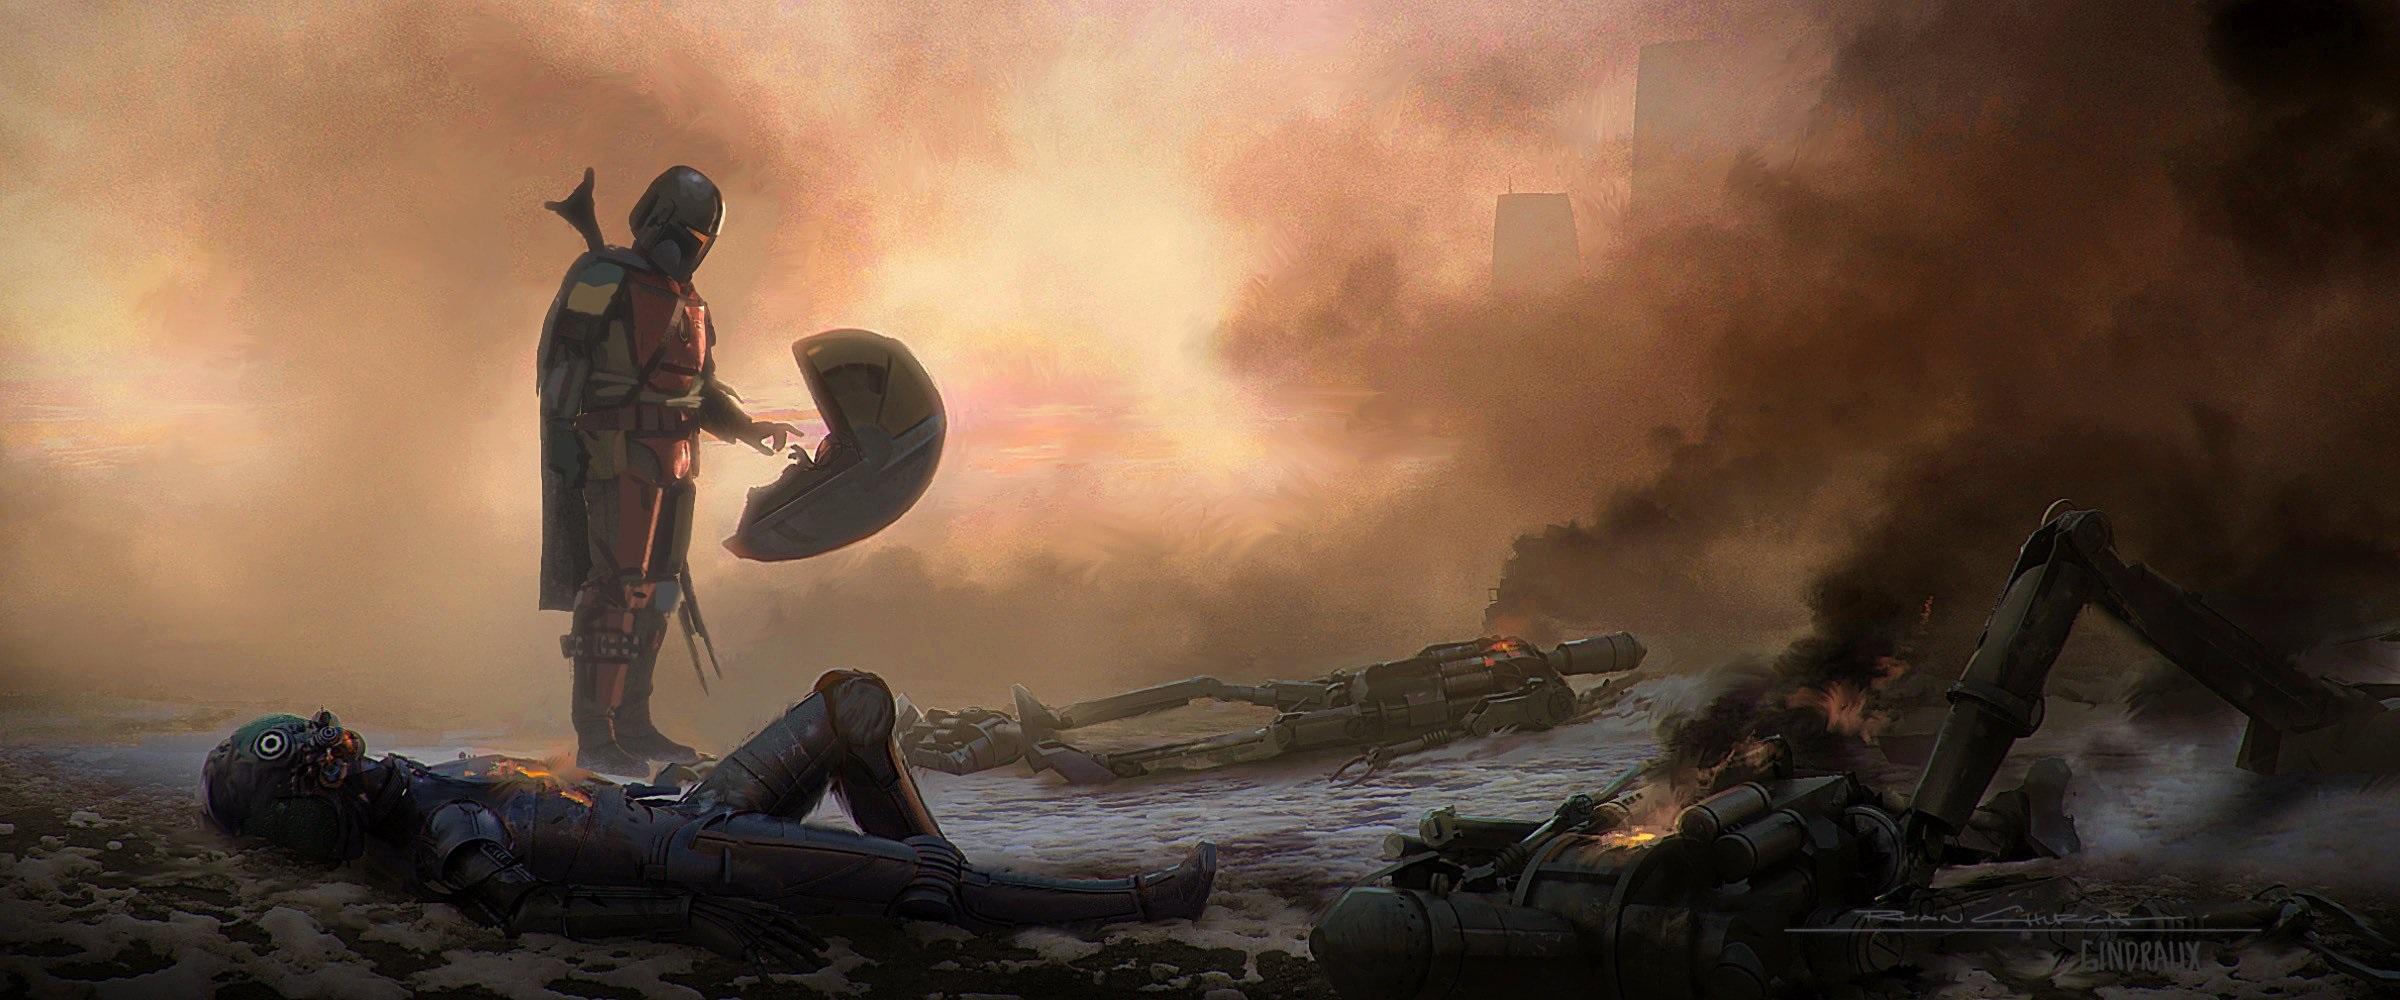 19 Beautiful Star Wars The Mandalorian TV Series Concept Art.